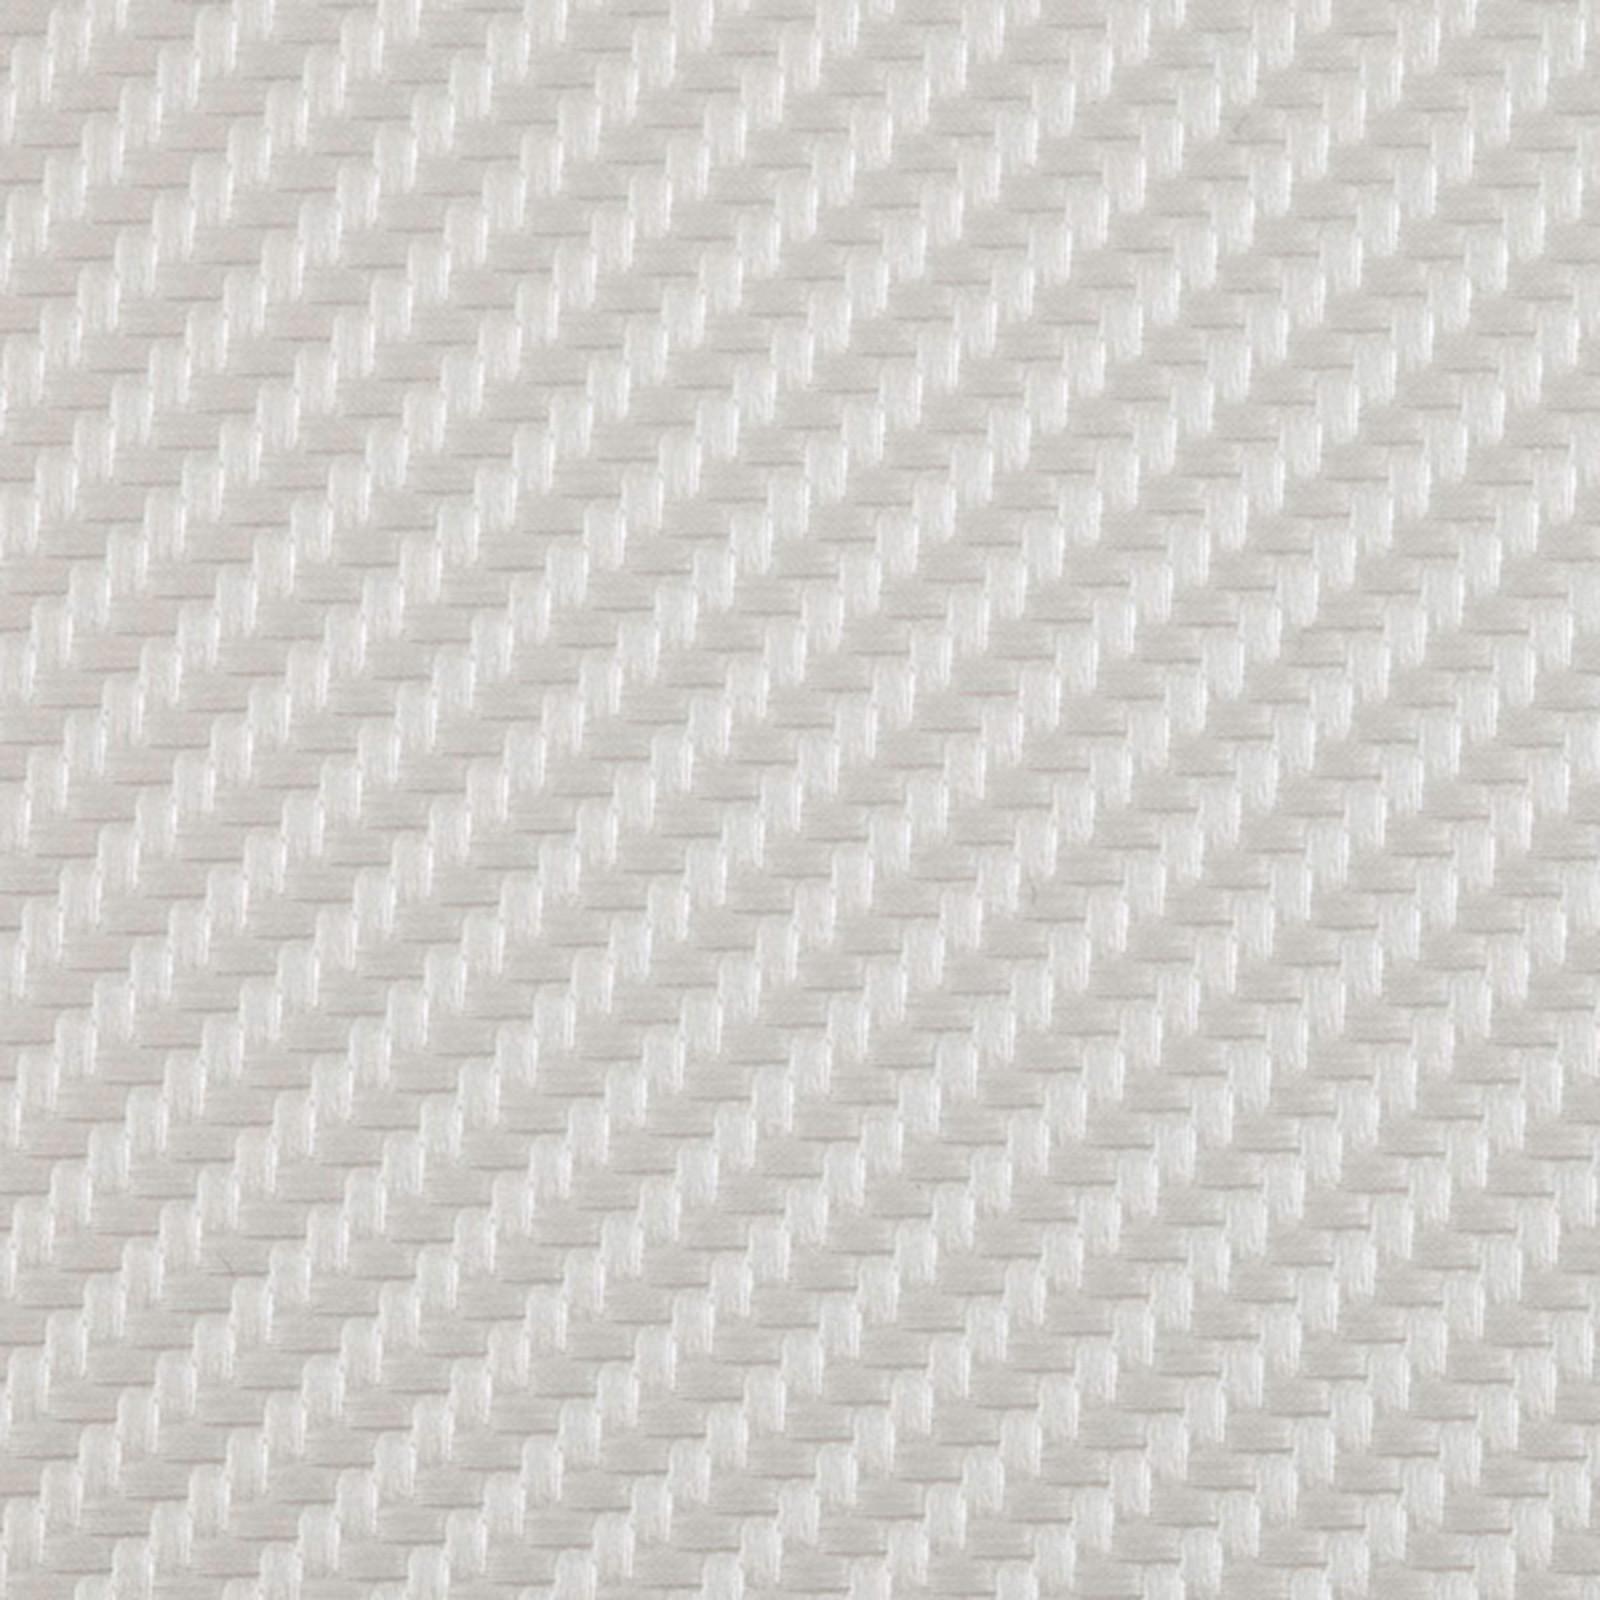 B5278 Carbon Fiber Pearl White Greenhouse Fabrics